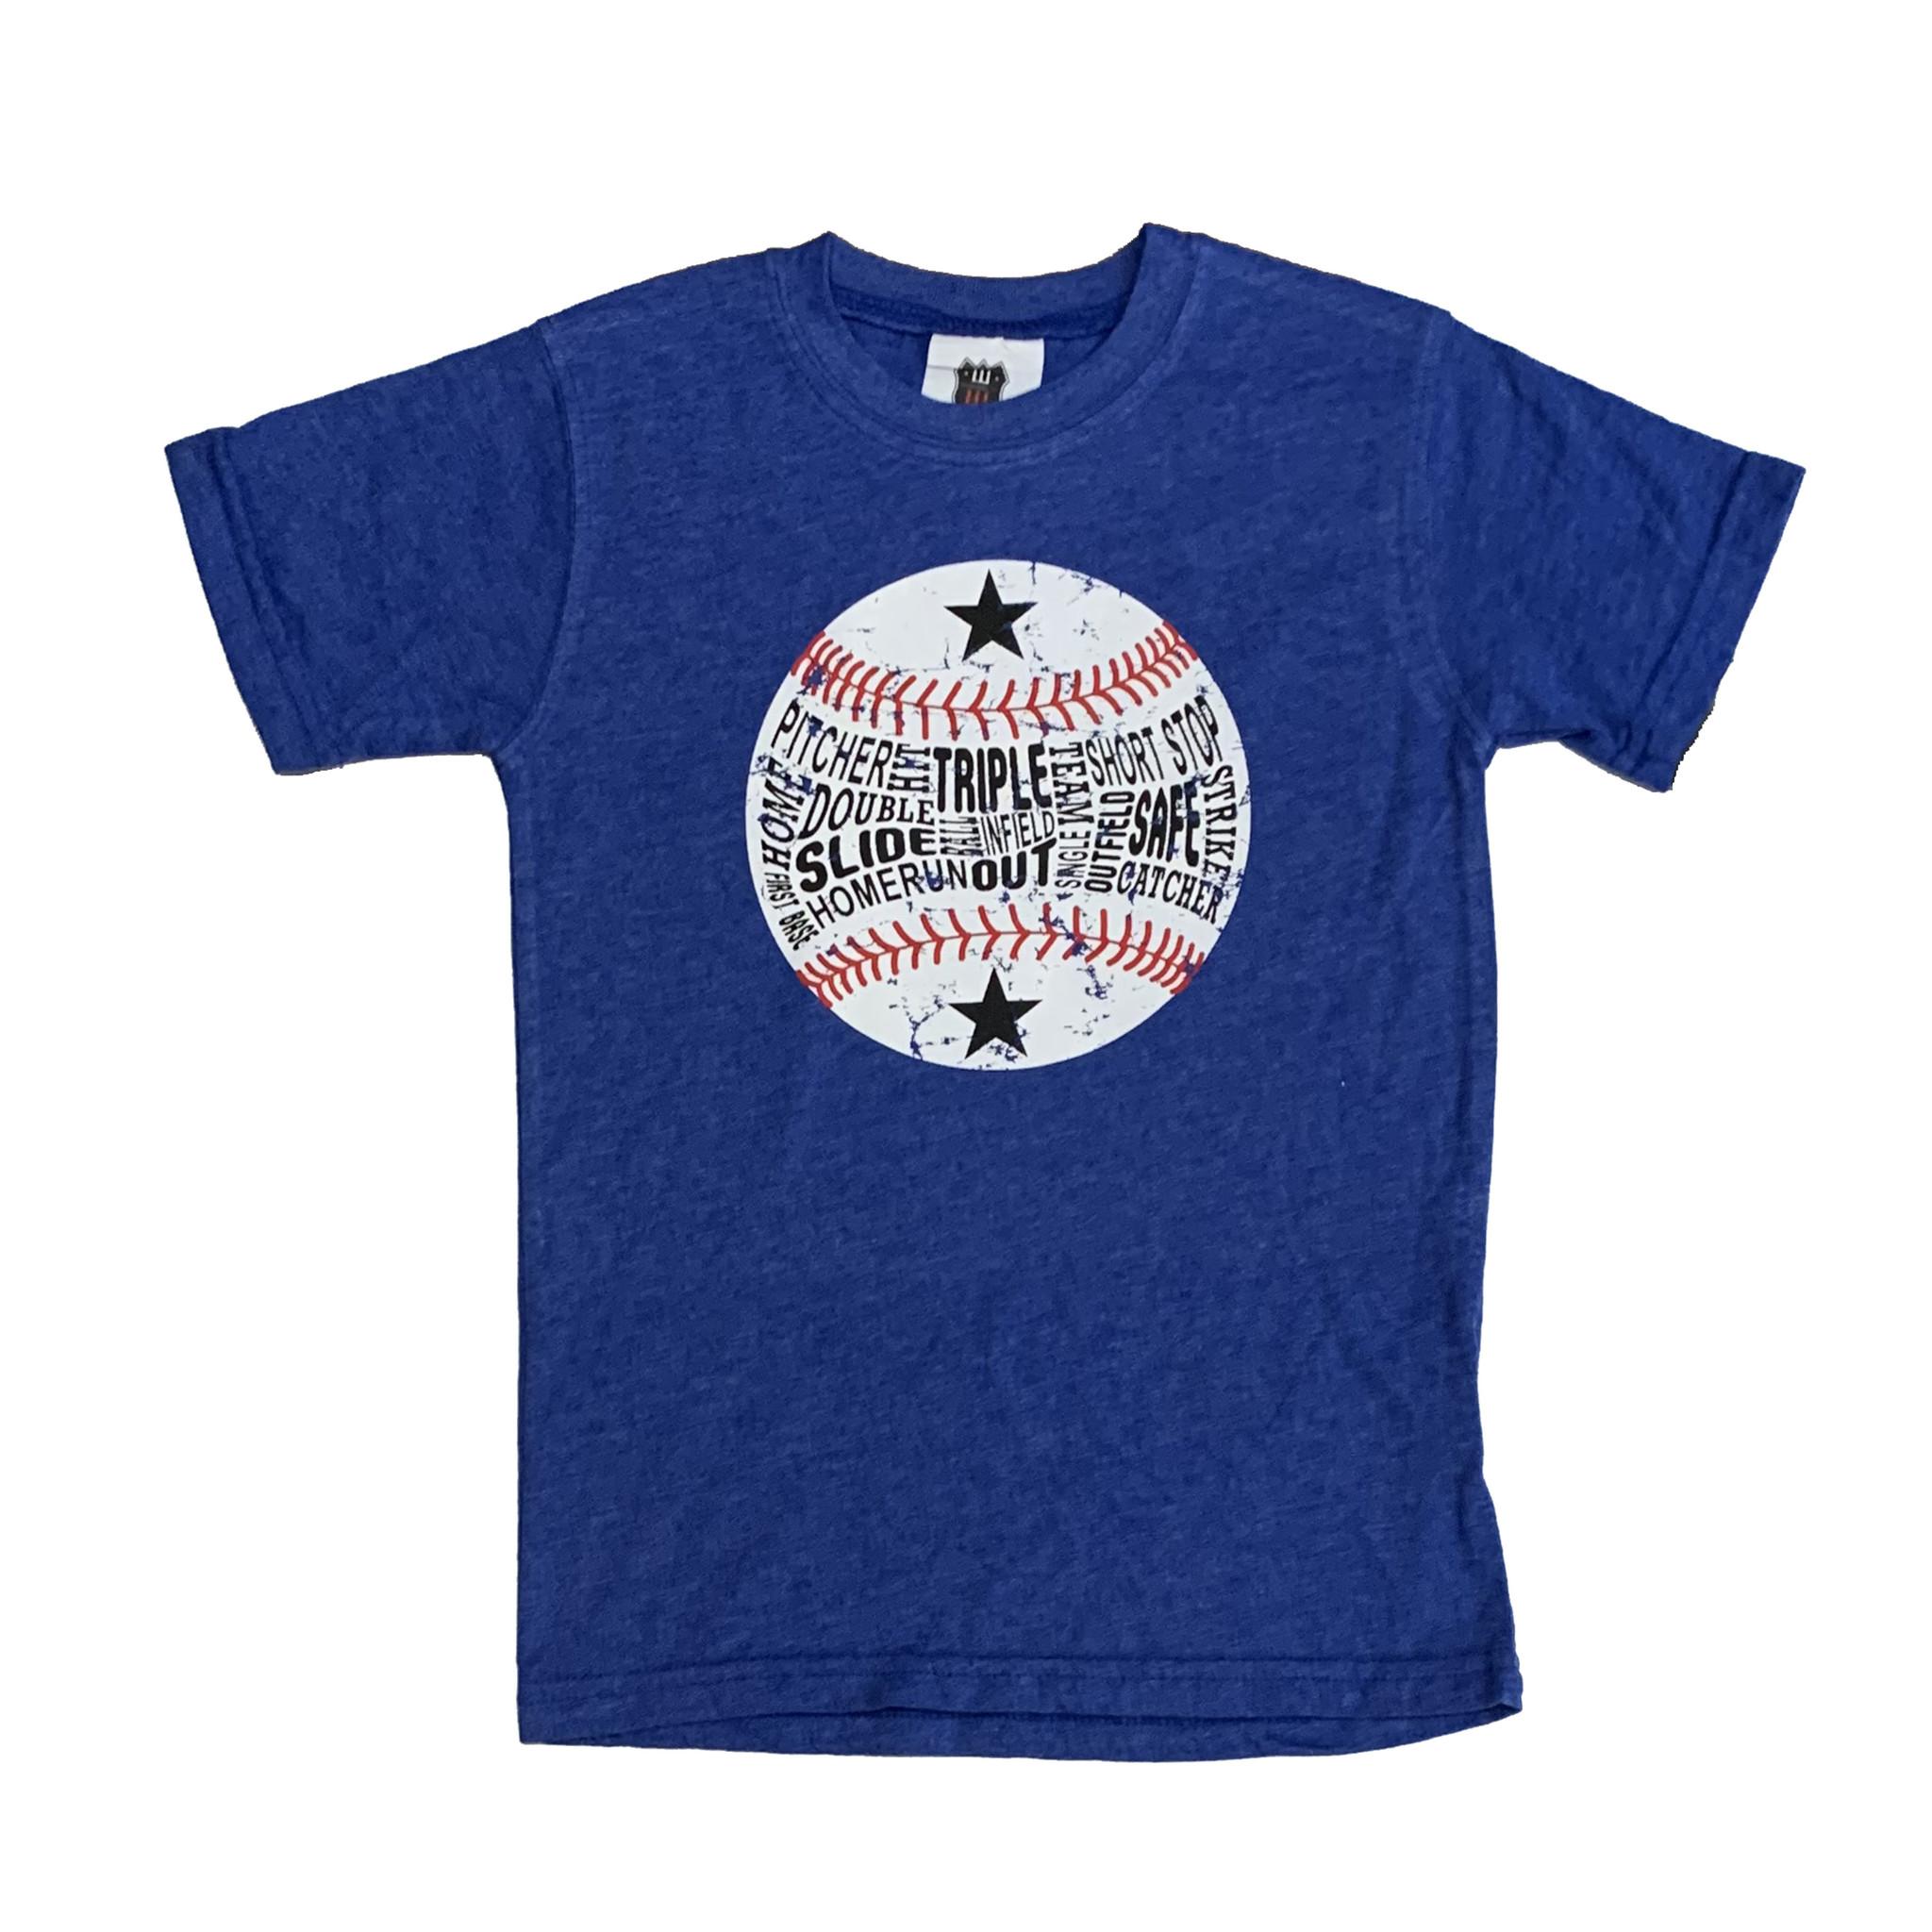 Wes & Willy Royal Heathered Baseball Tee